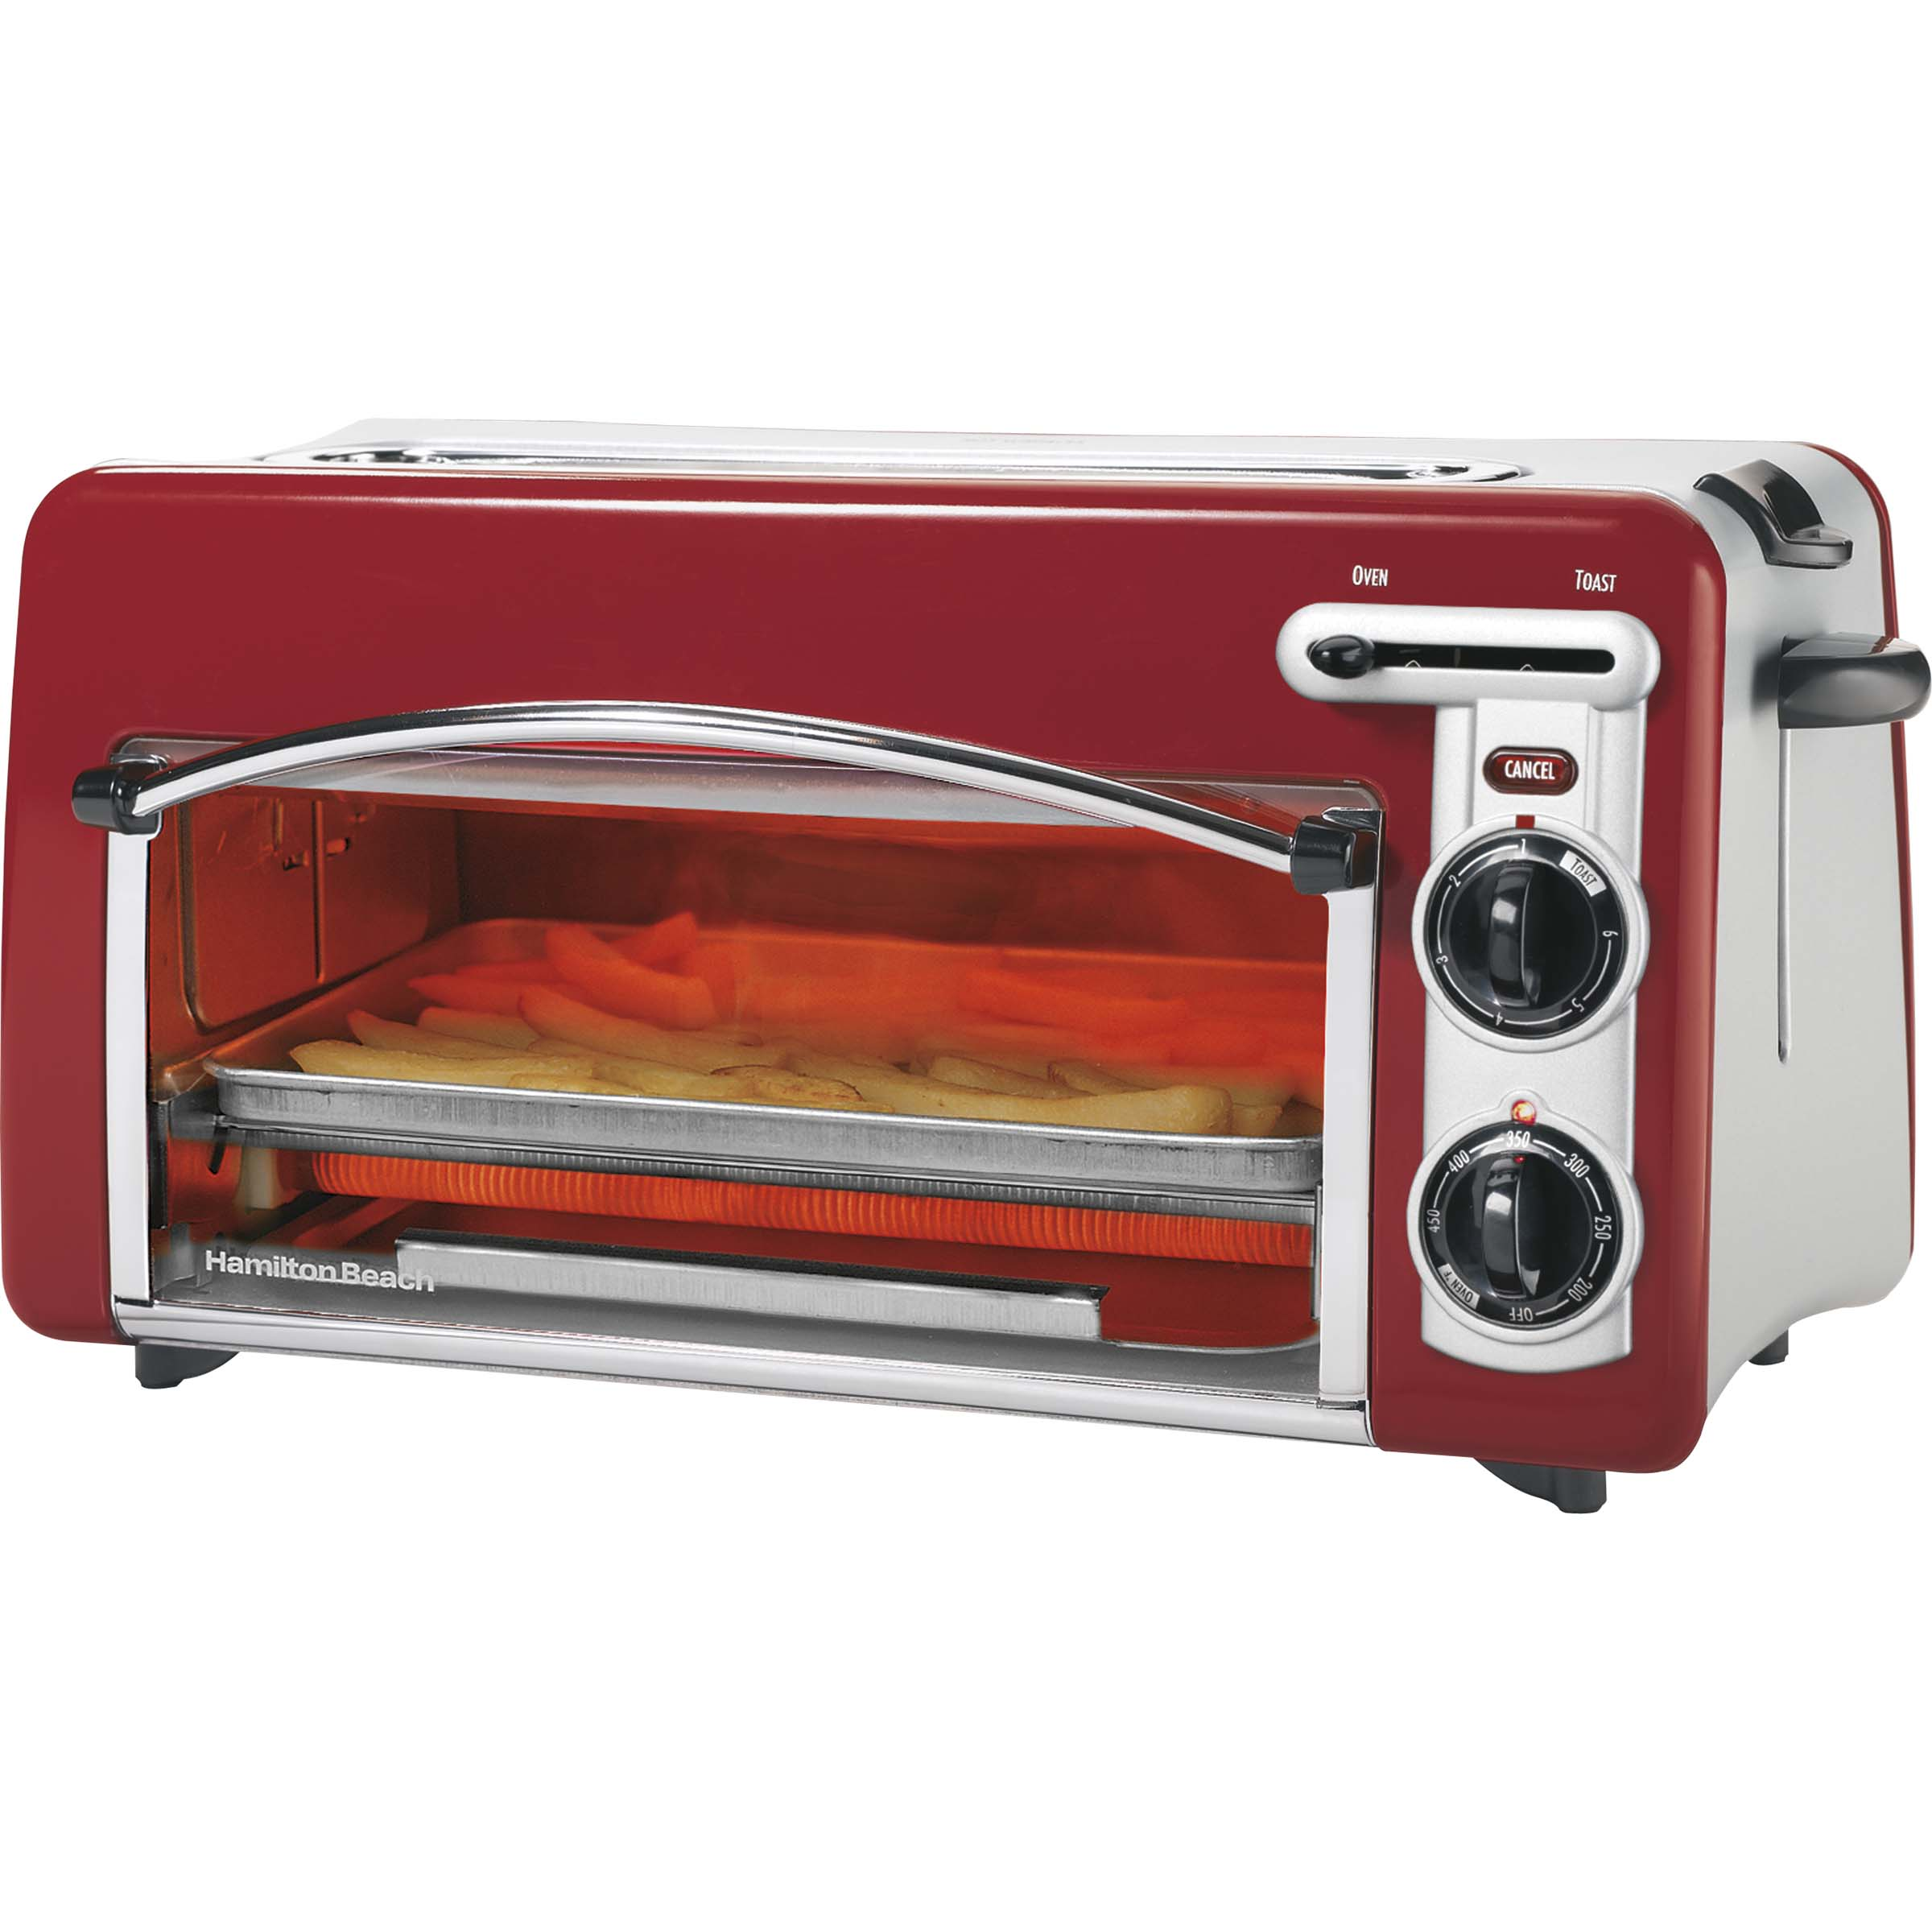 Hamilton Beach Toastation Toaster & Oven - Red (22703H) - Toast - Red